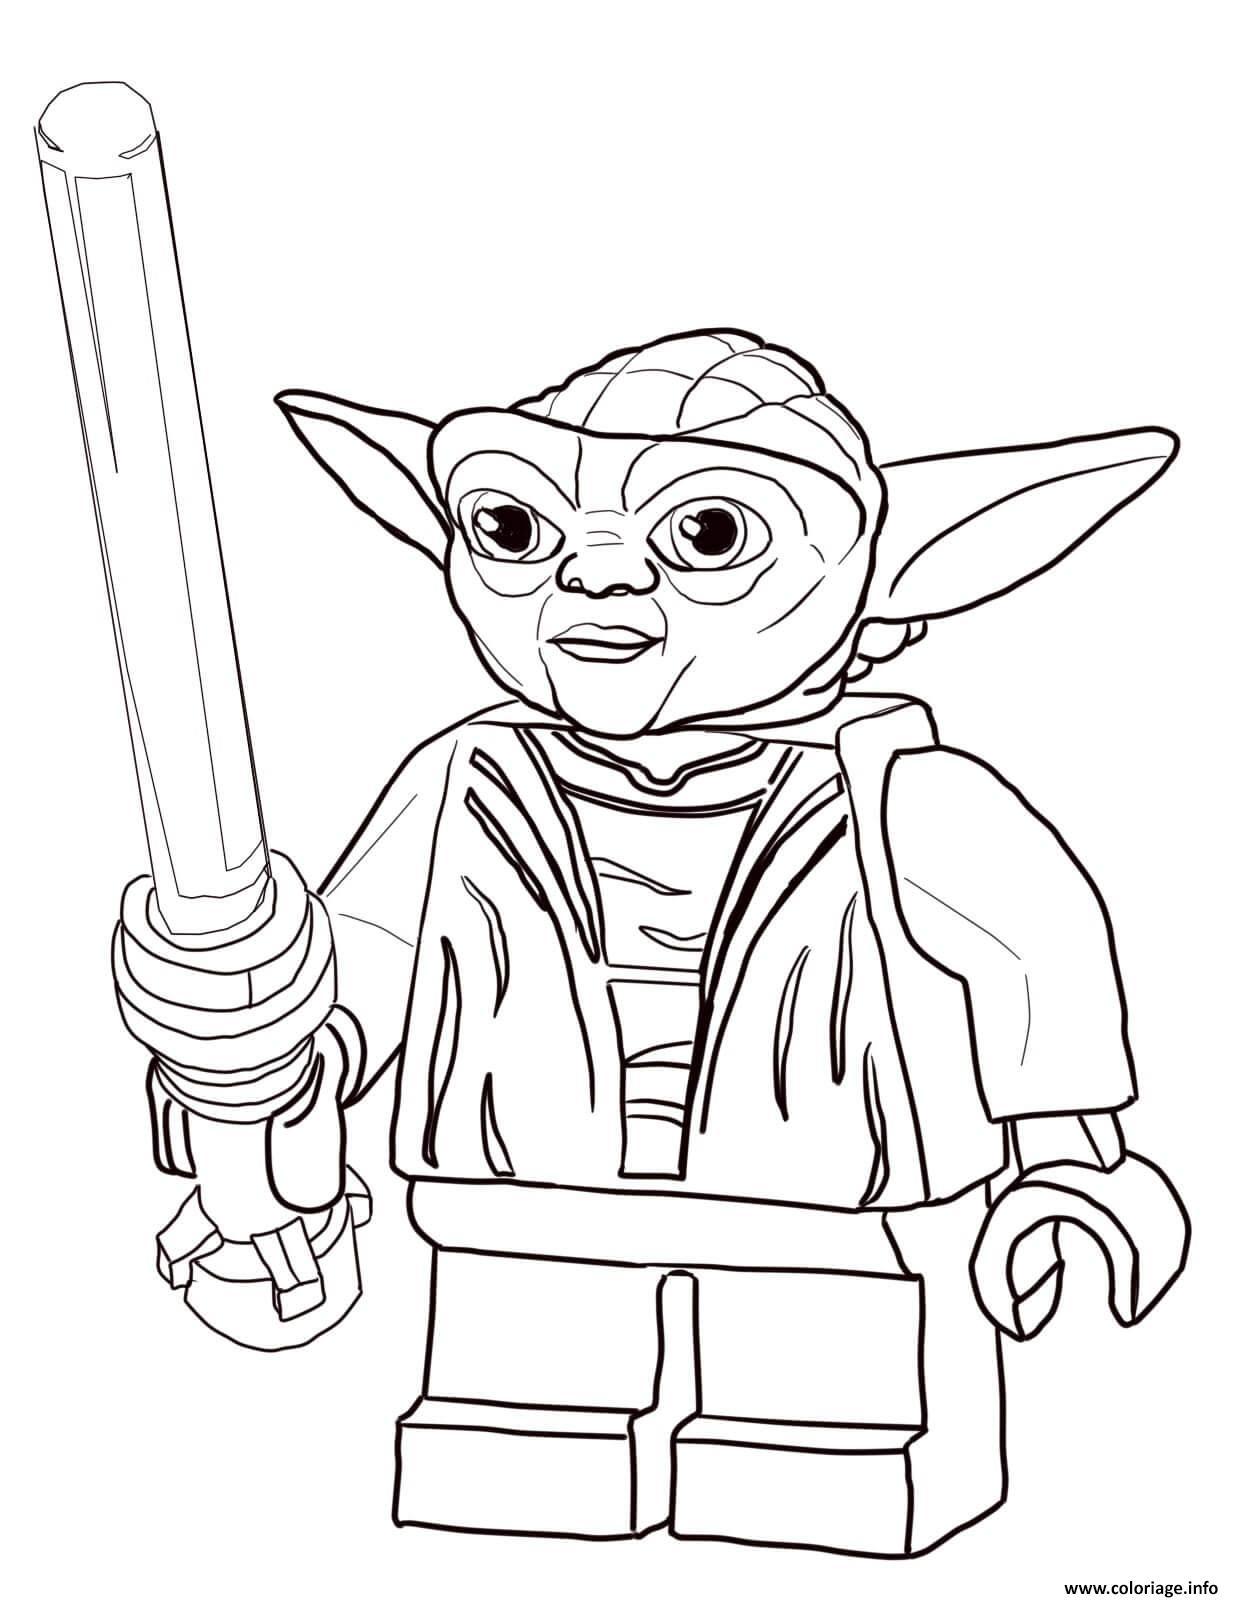 Coloriage lego star wars master yoda dessin - Coloriage star wars yoda ...